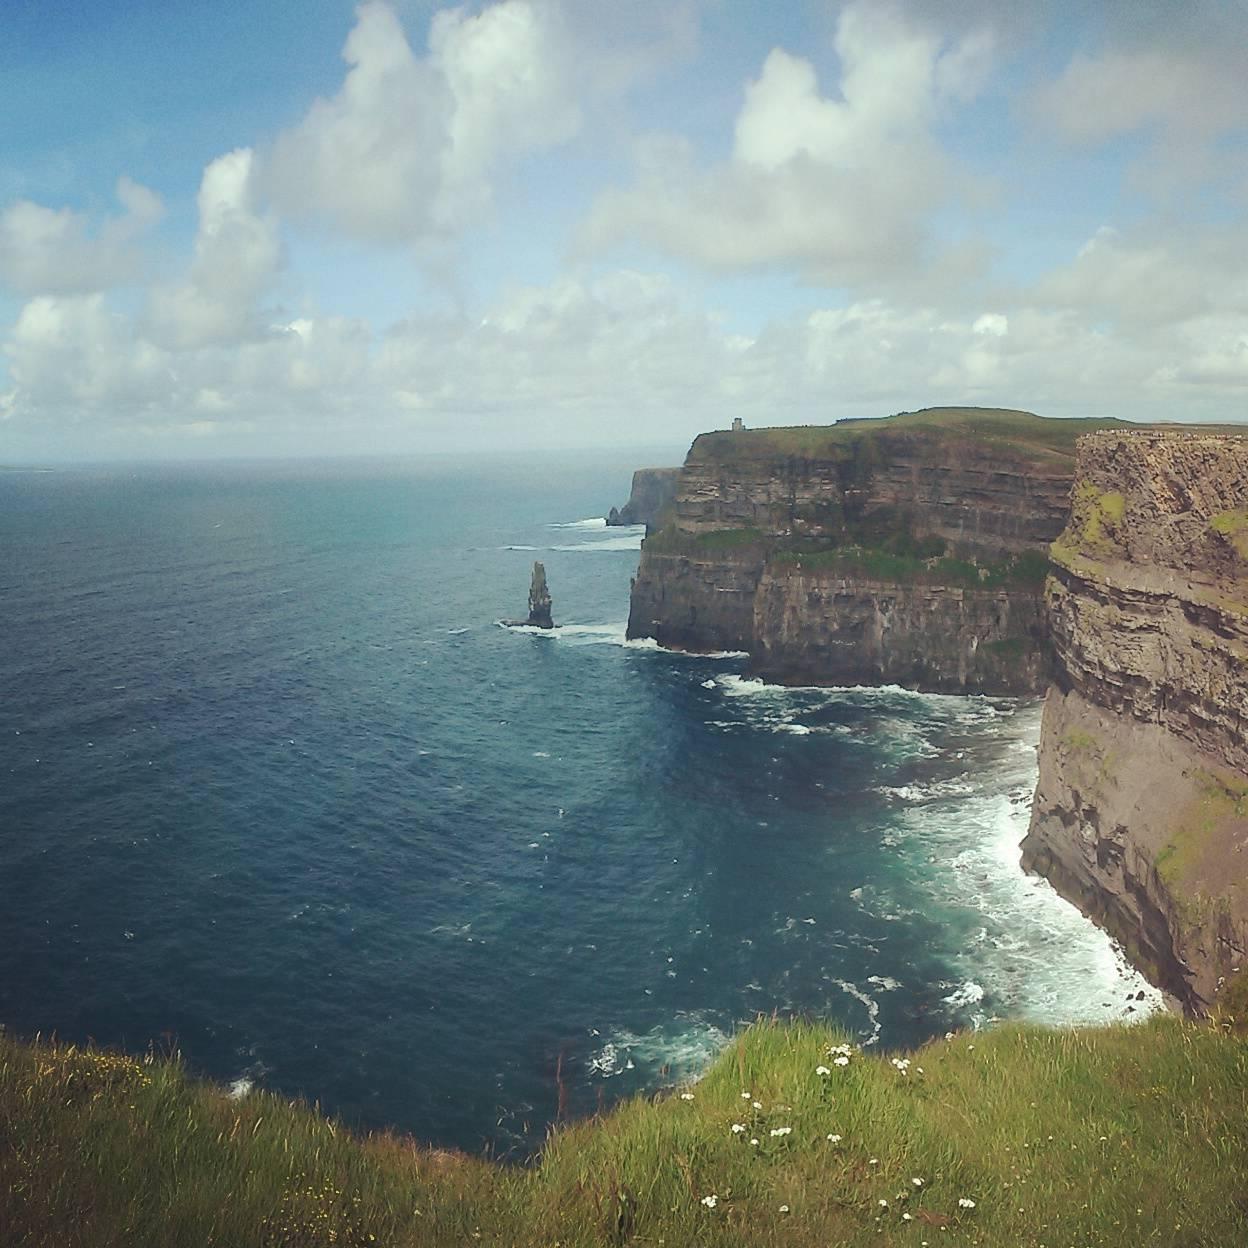 Photo 1: CLIFFS OF MOHER, IRLANDE